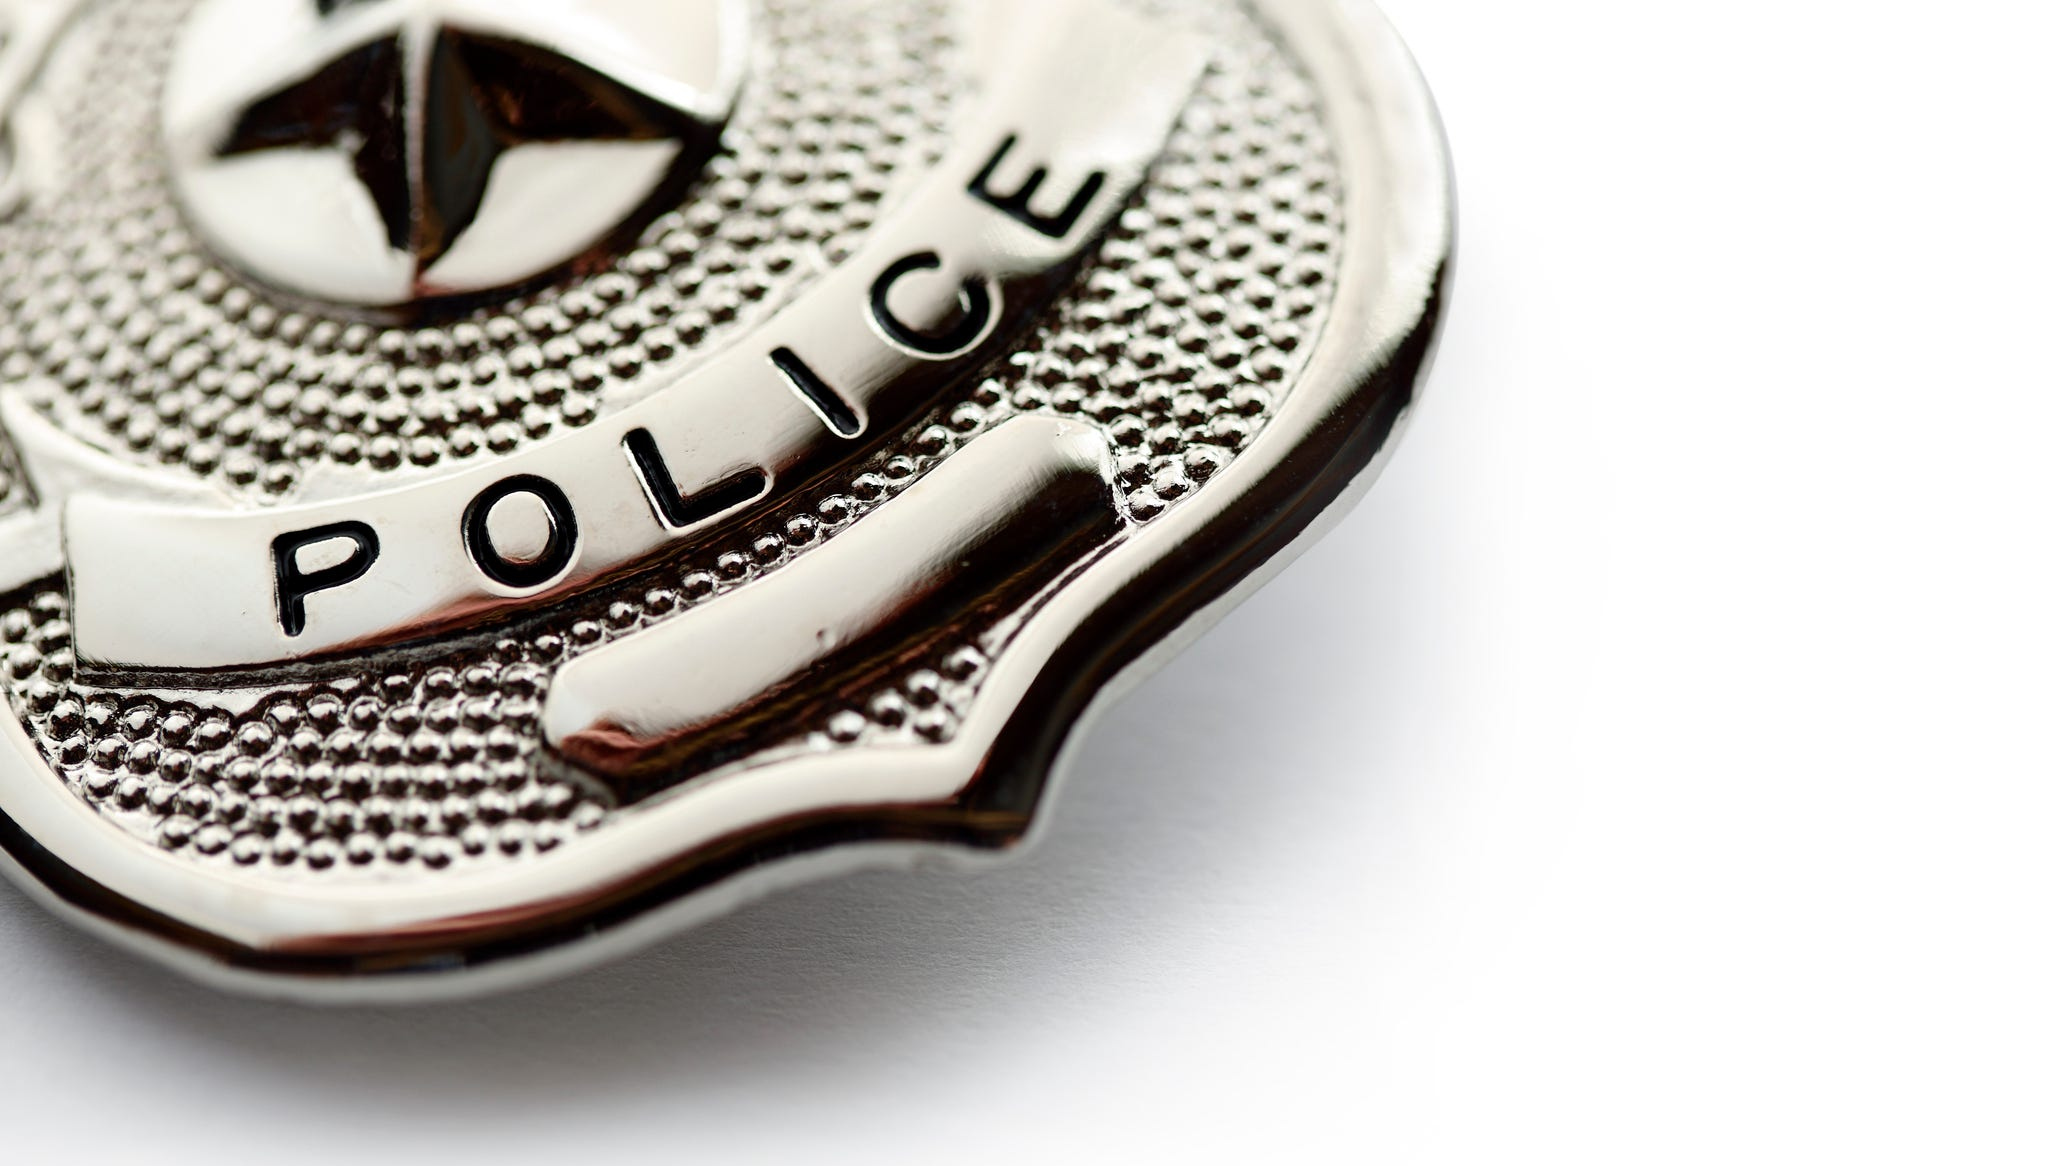 Police badge on white background.